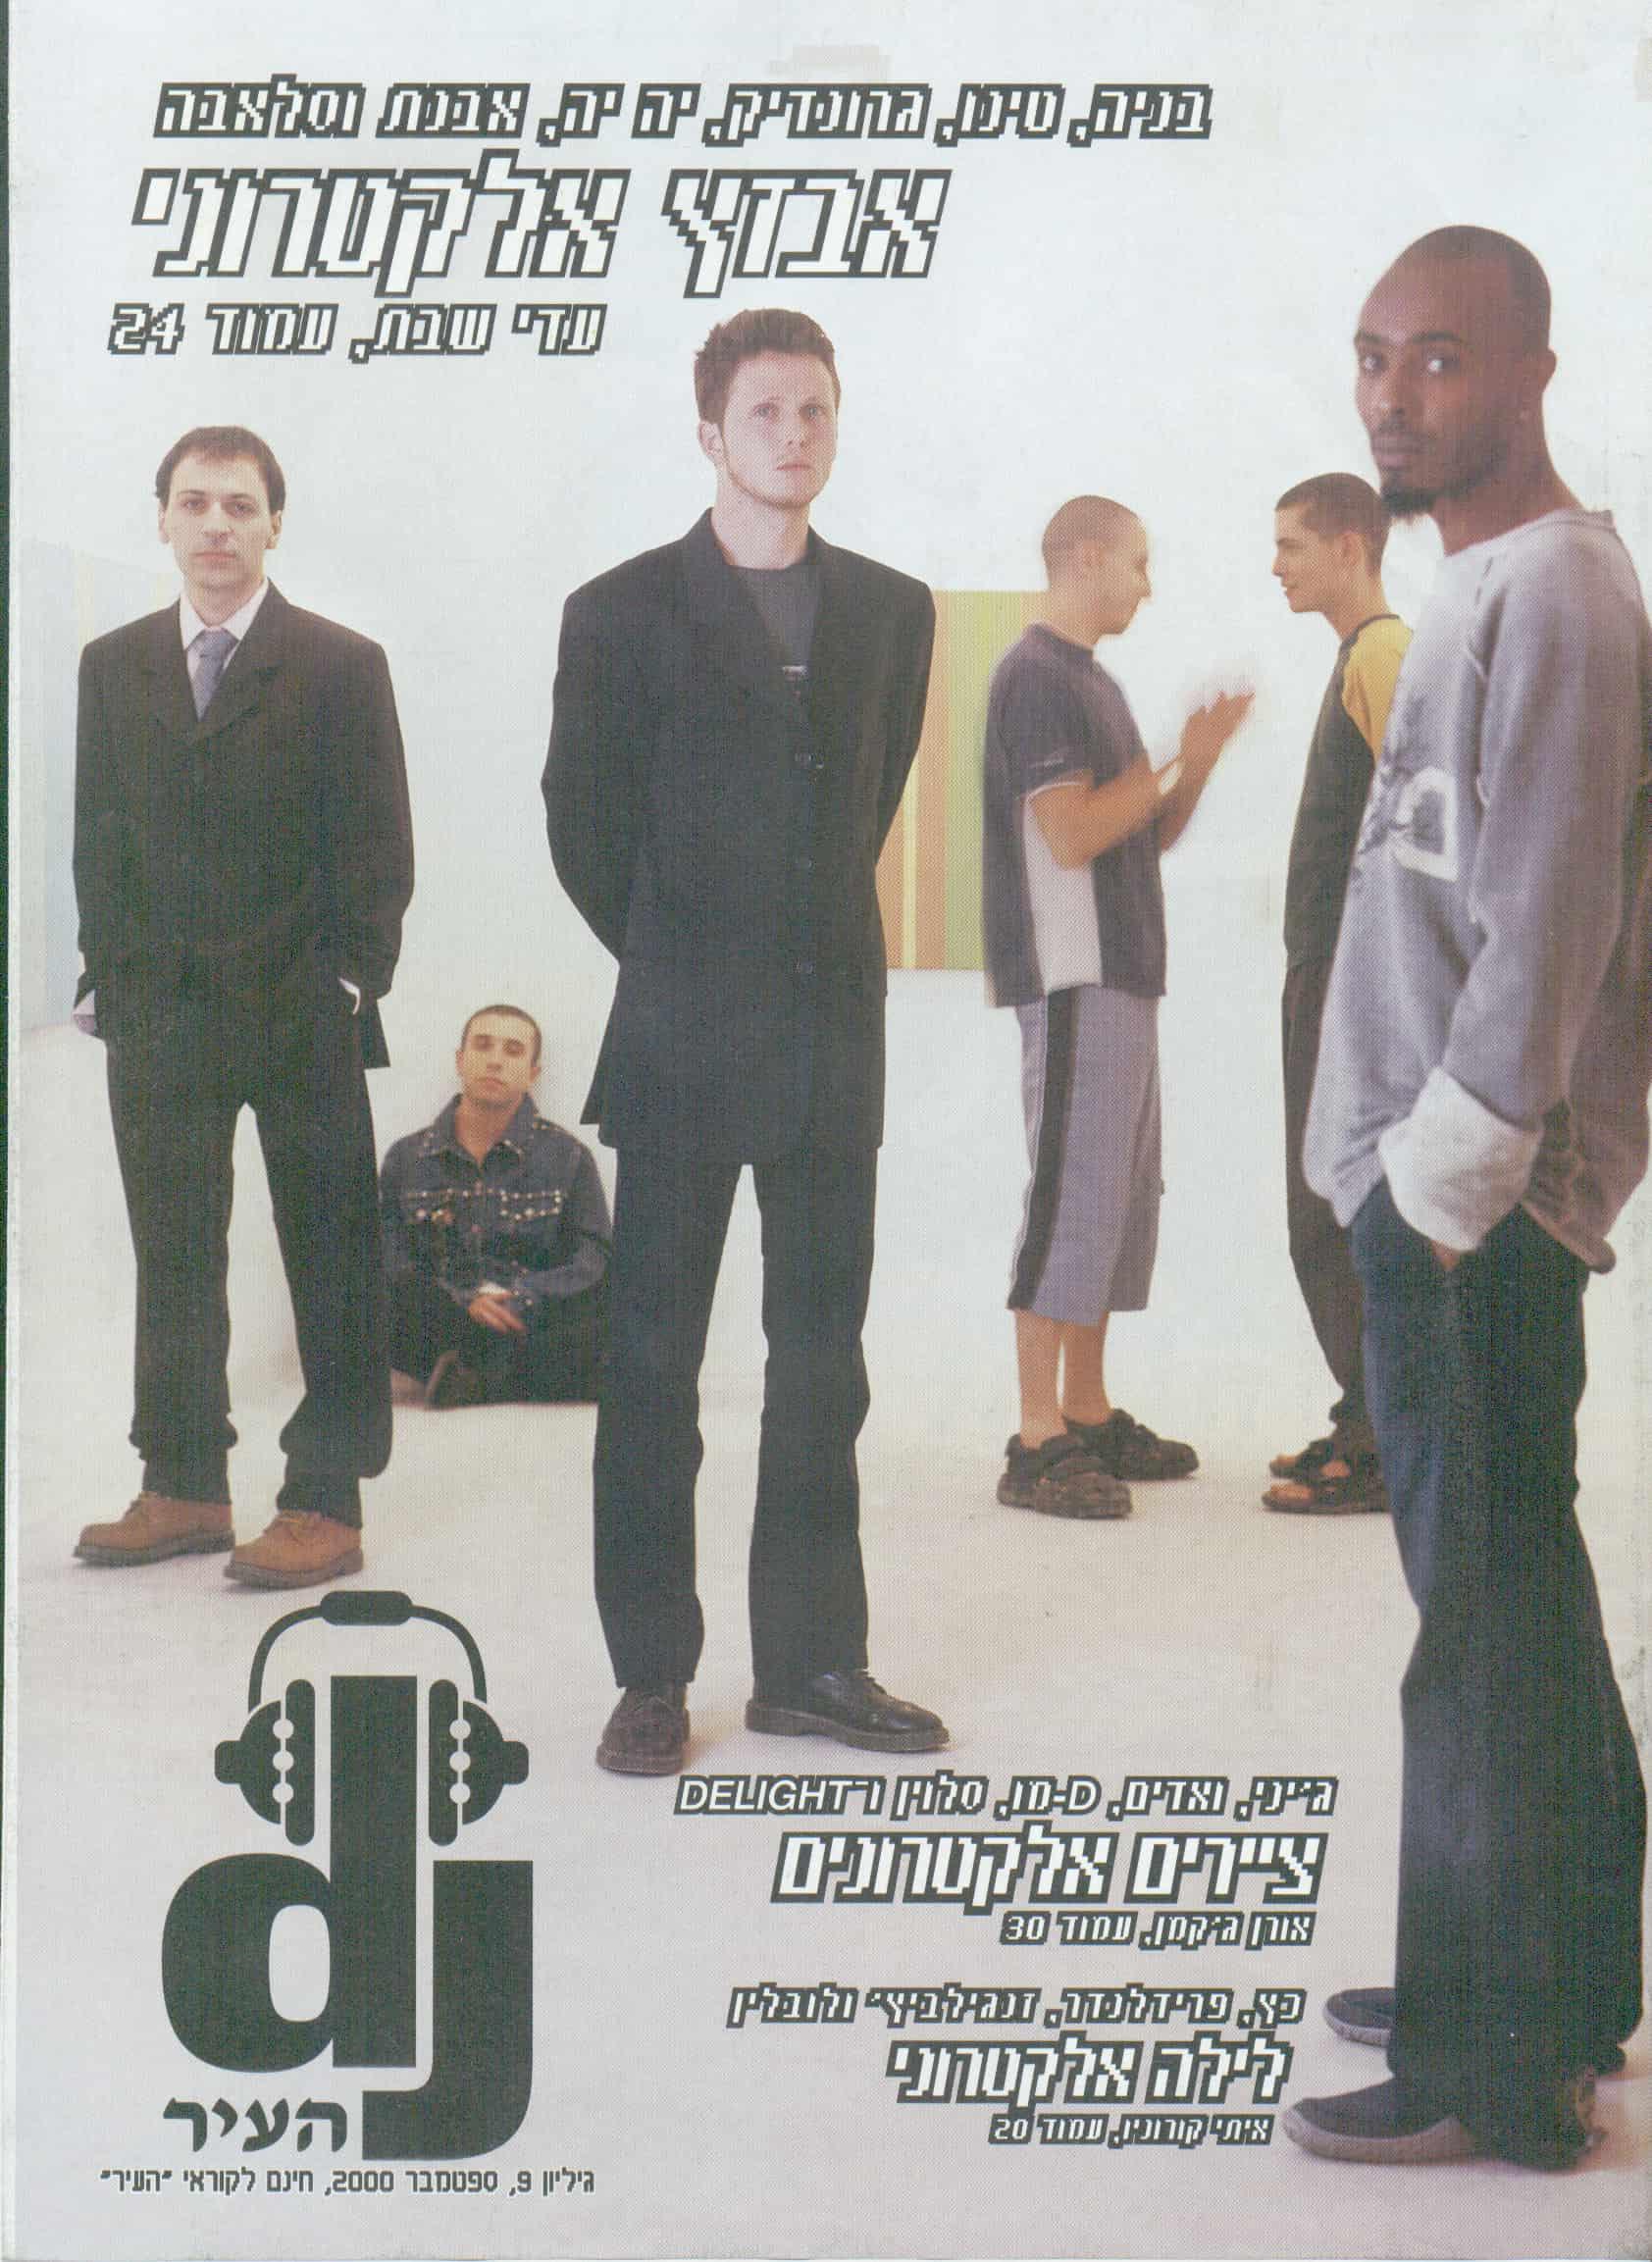 dj1 - Avuz Electroni, DJ Ha-Ir, Fact records, 06.02.2001